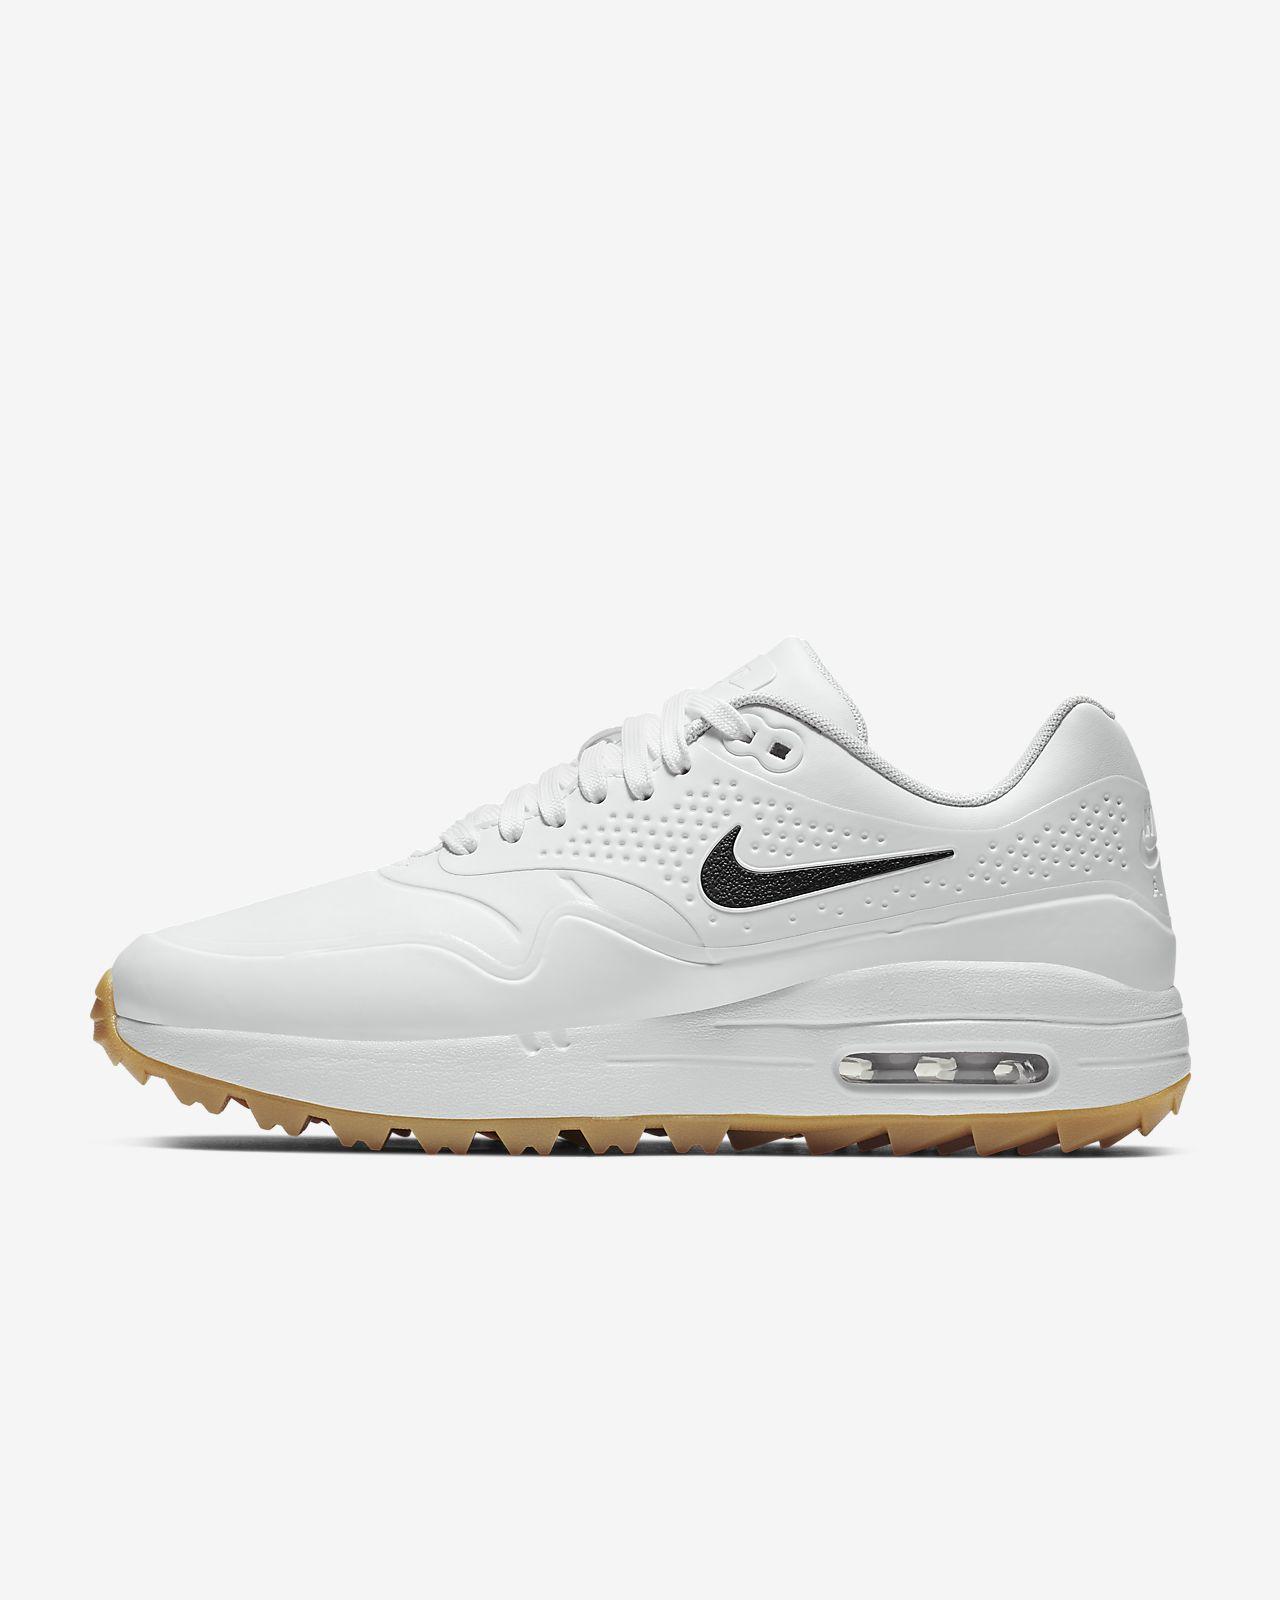 half off 5ab66 be33b ... Sapatilhas de golfe Nike Air Max 1 G para mulher